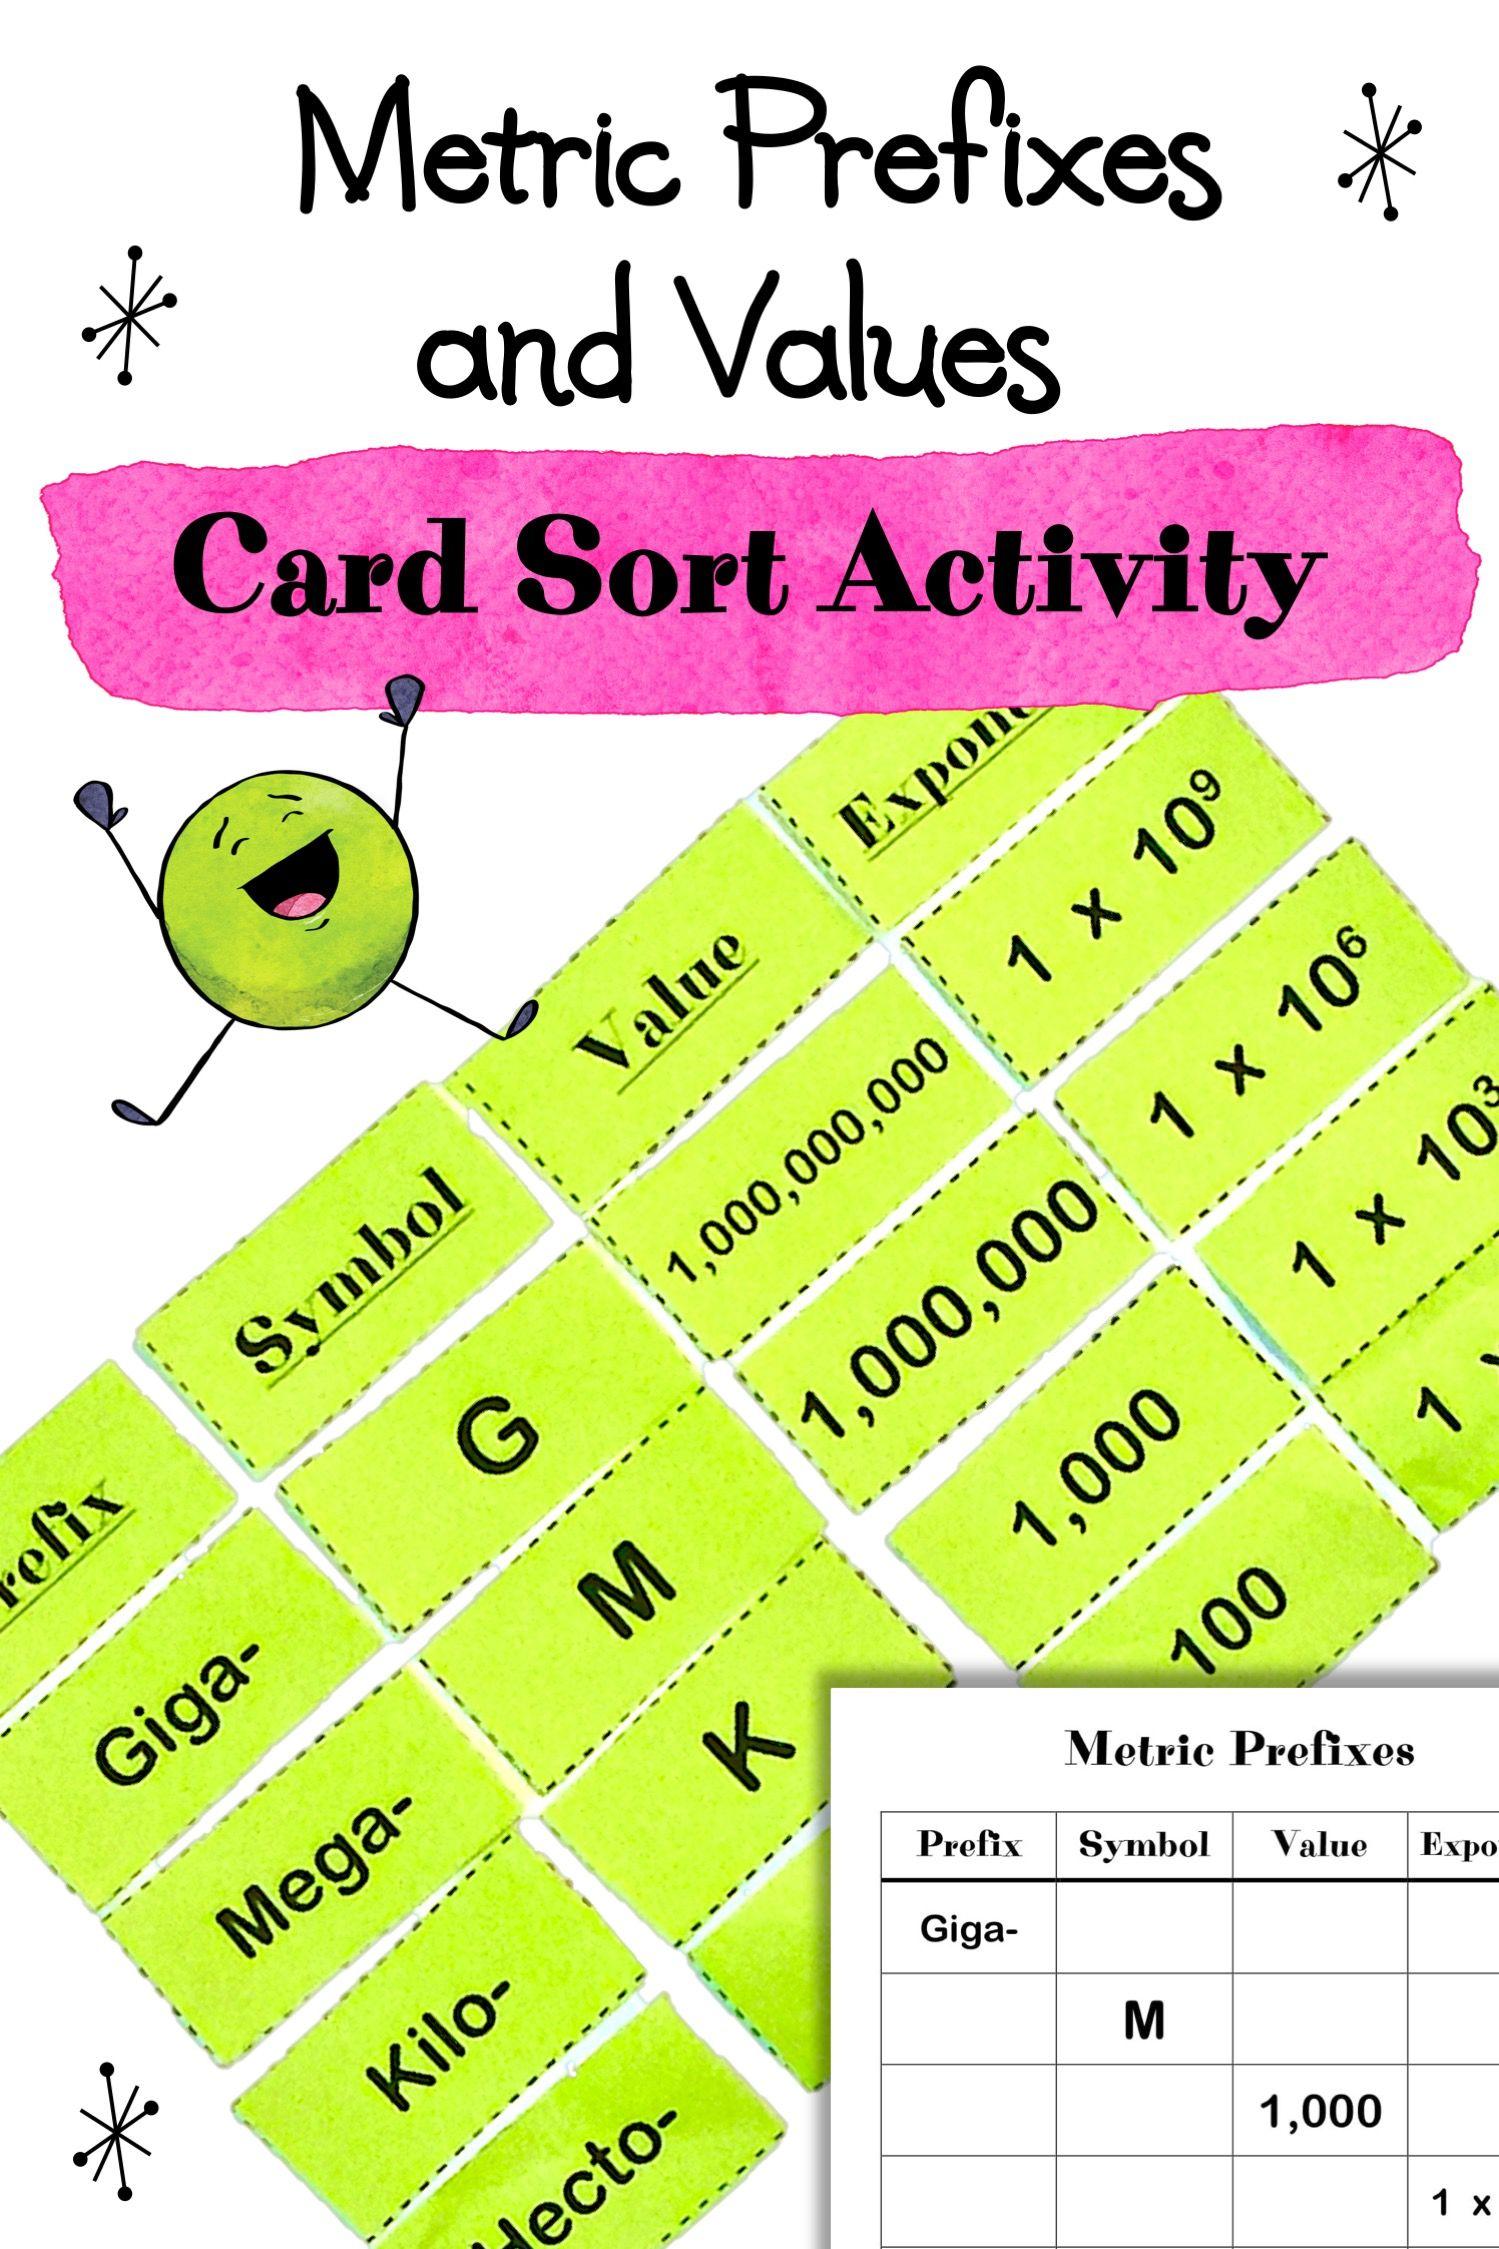 Card Sort Activity